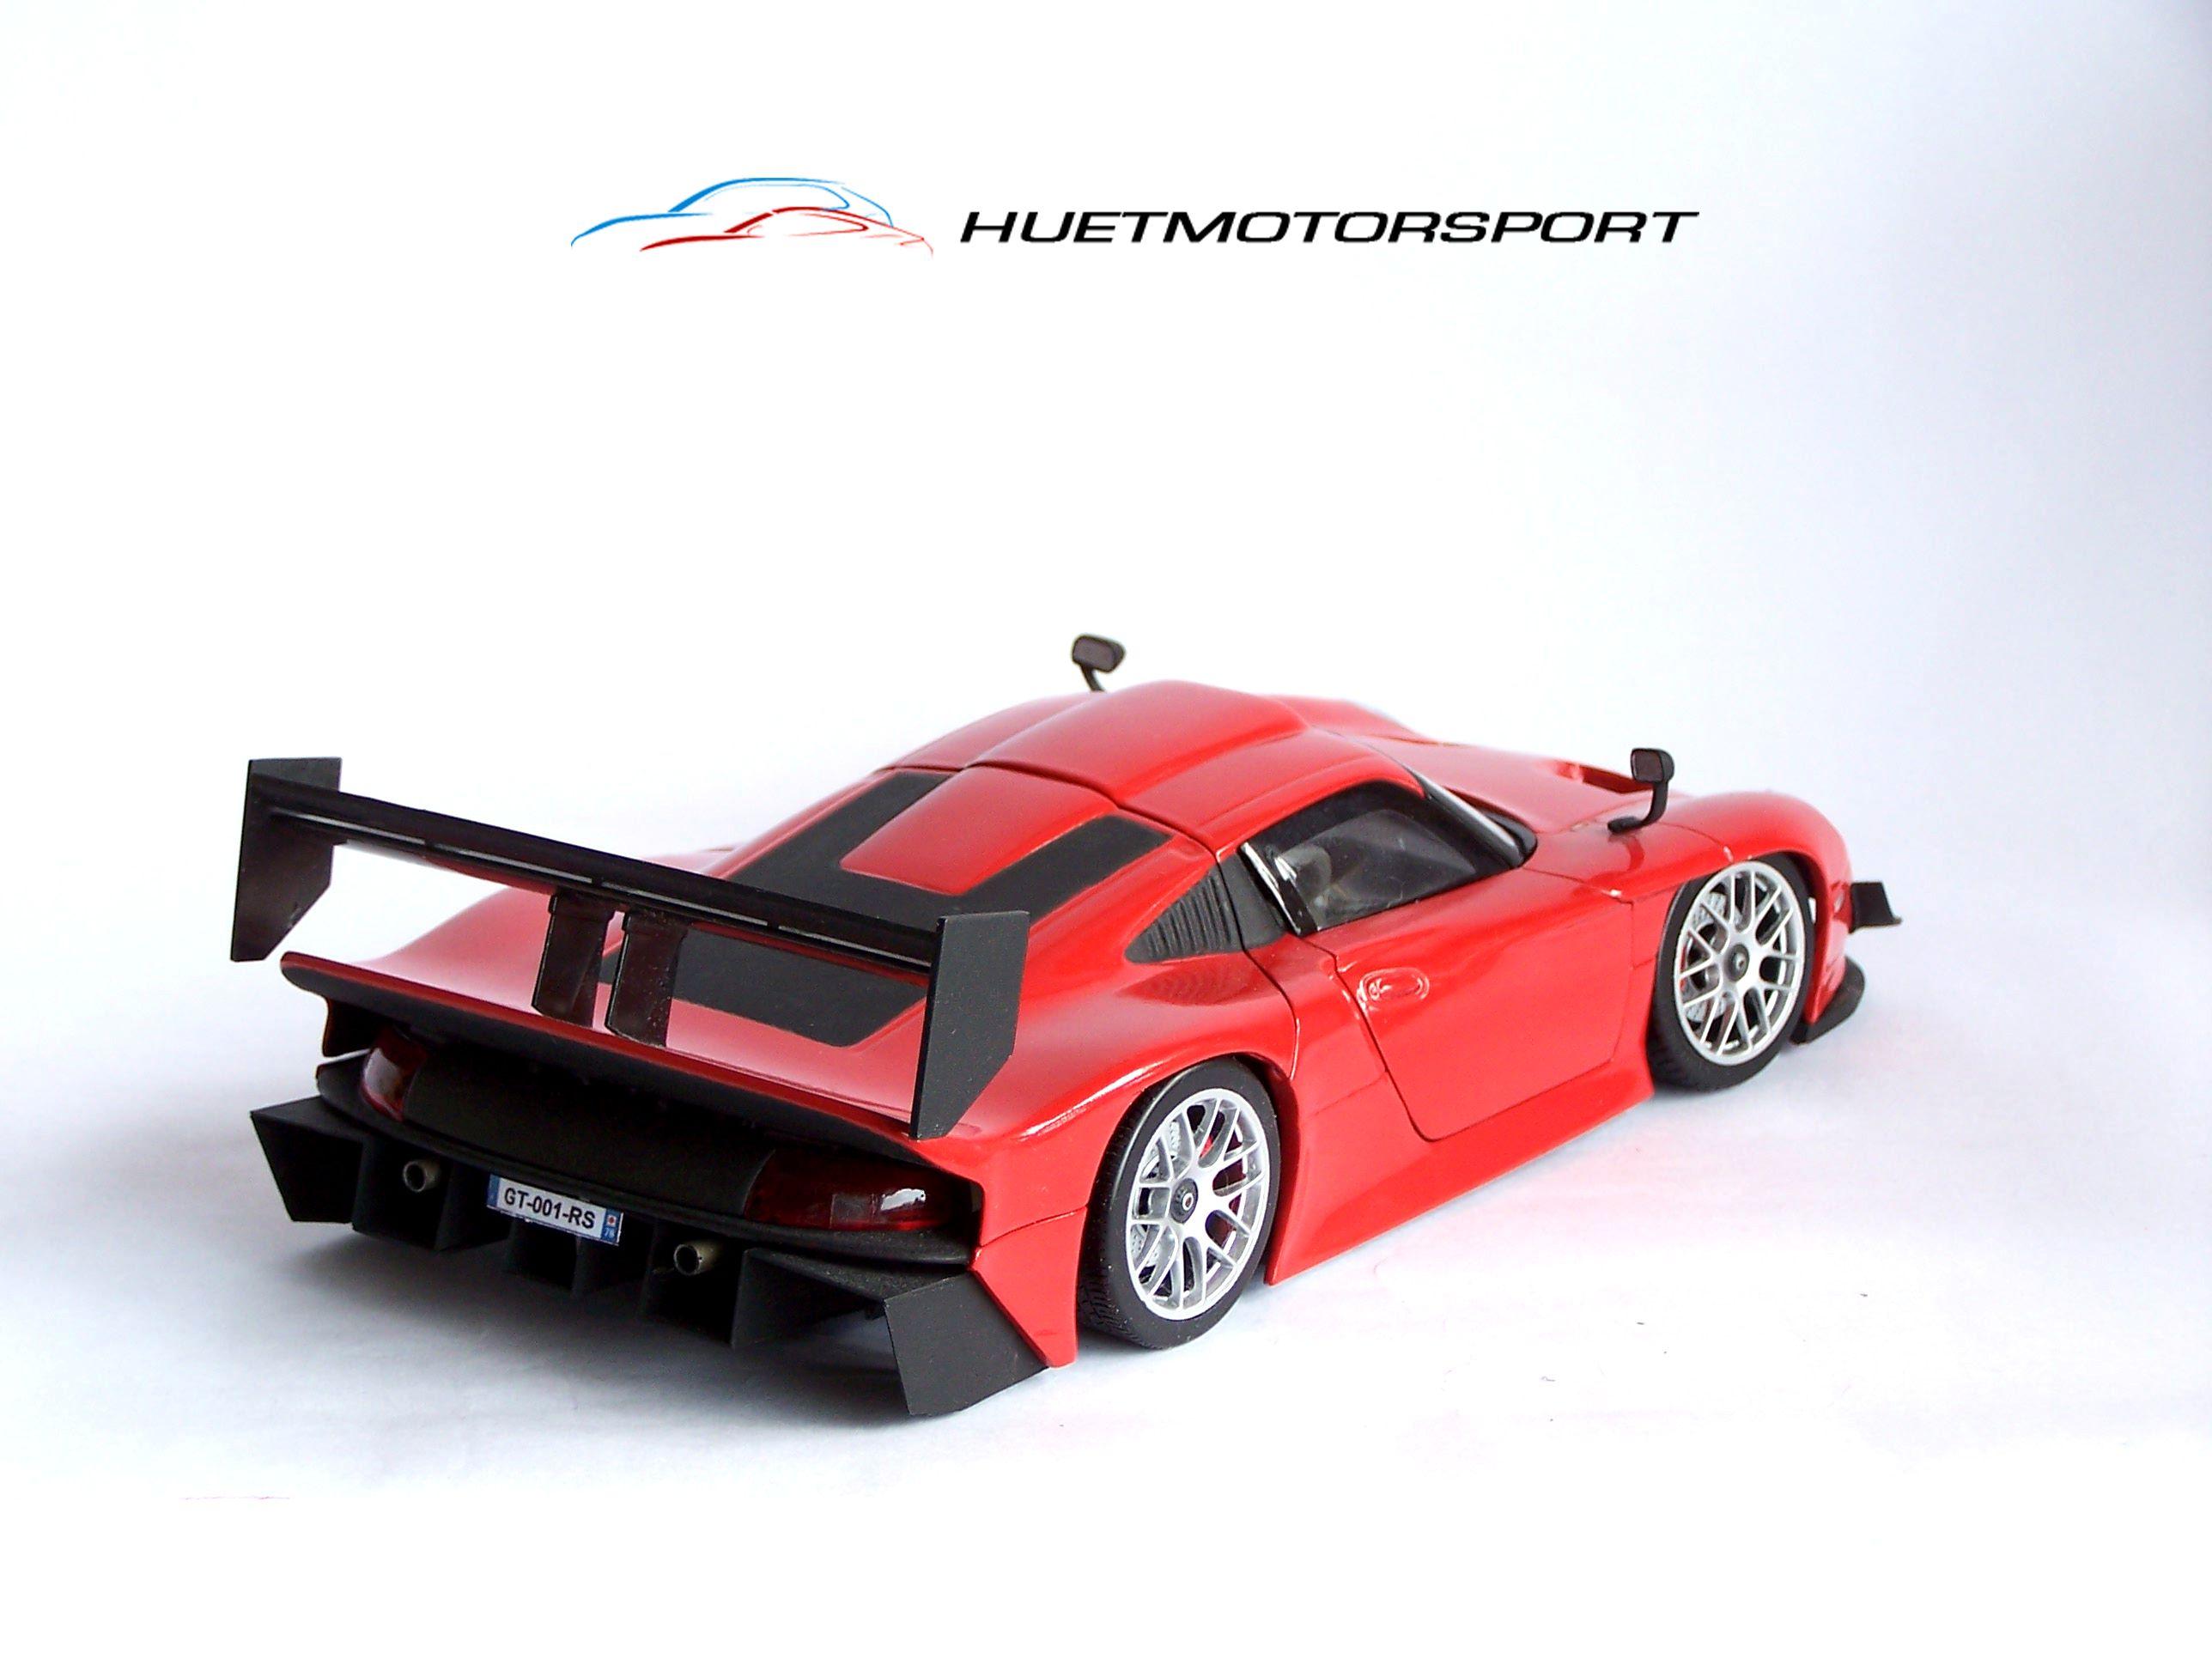 5db49389e8807bf8c3a6df9b9a677f53 Outstanding Maisto Porsche 911 Gt1 Le Mans 1998 Cars Trend